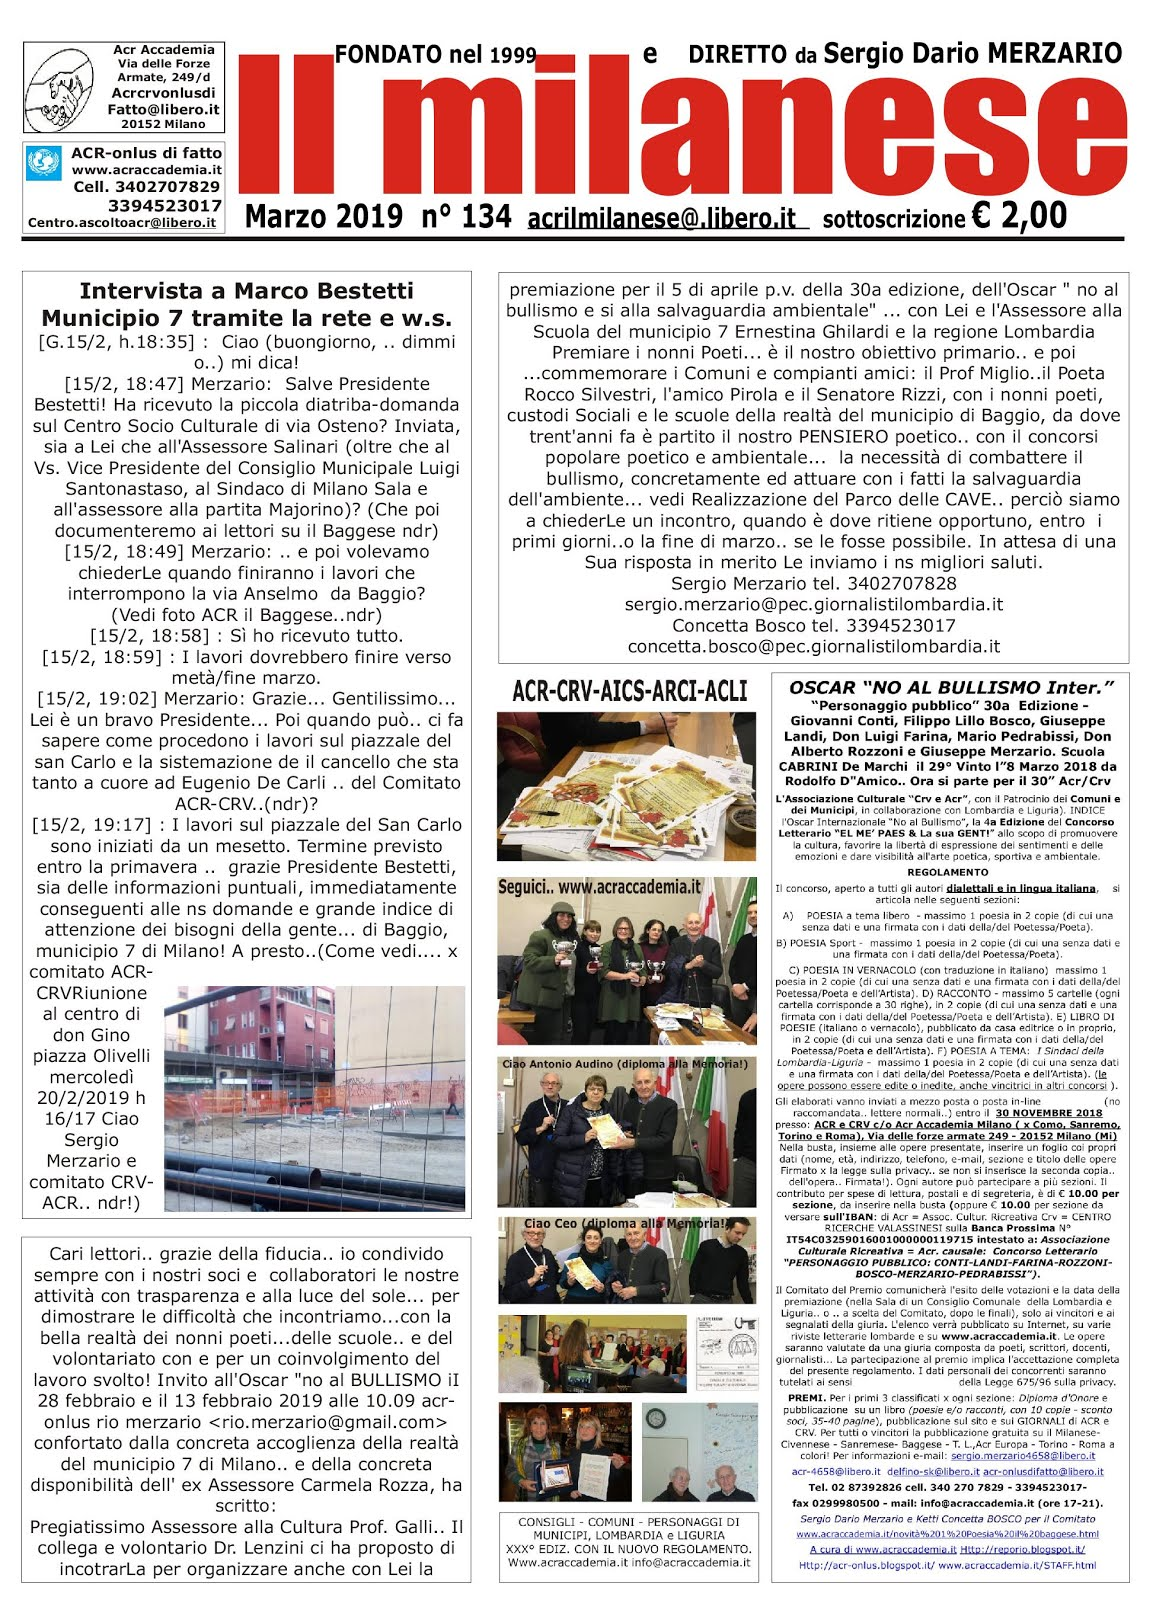 "ACR-CRV e Aics"".. OSCAR NO AL BULLISMO 30a Ediz. PUESII e Artist"".."